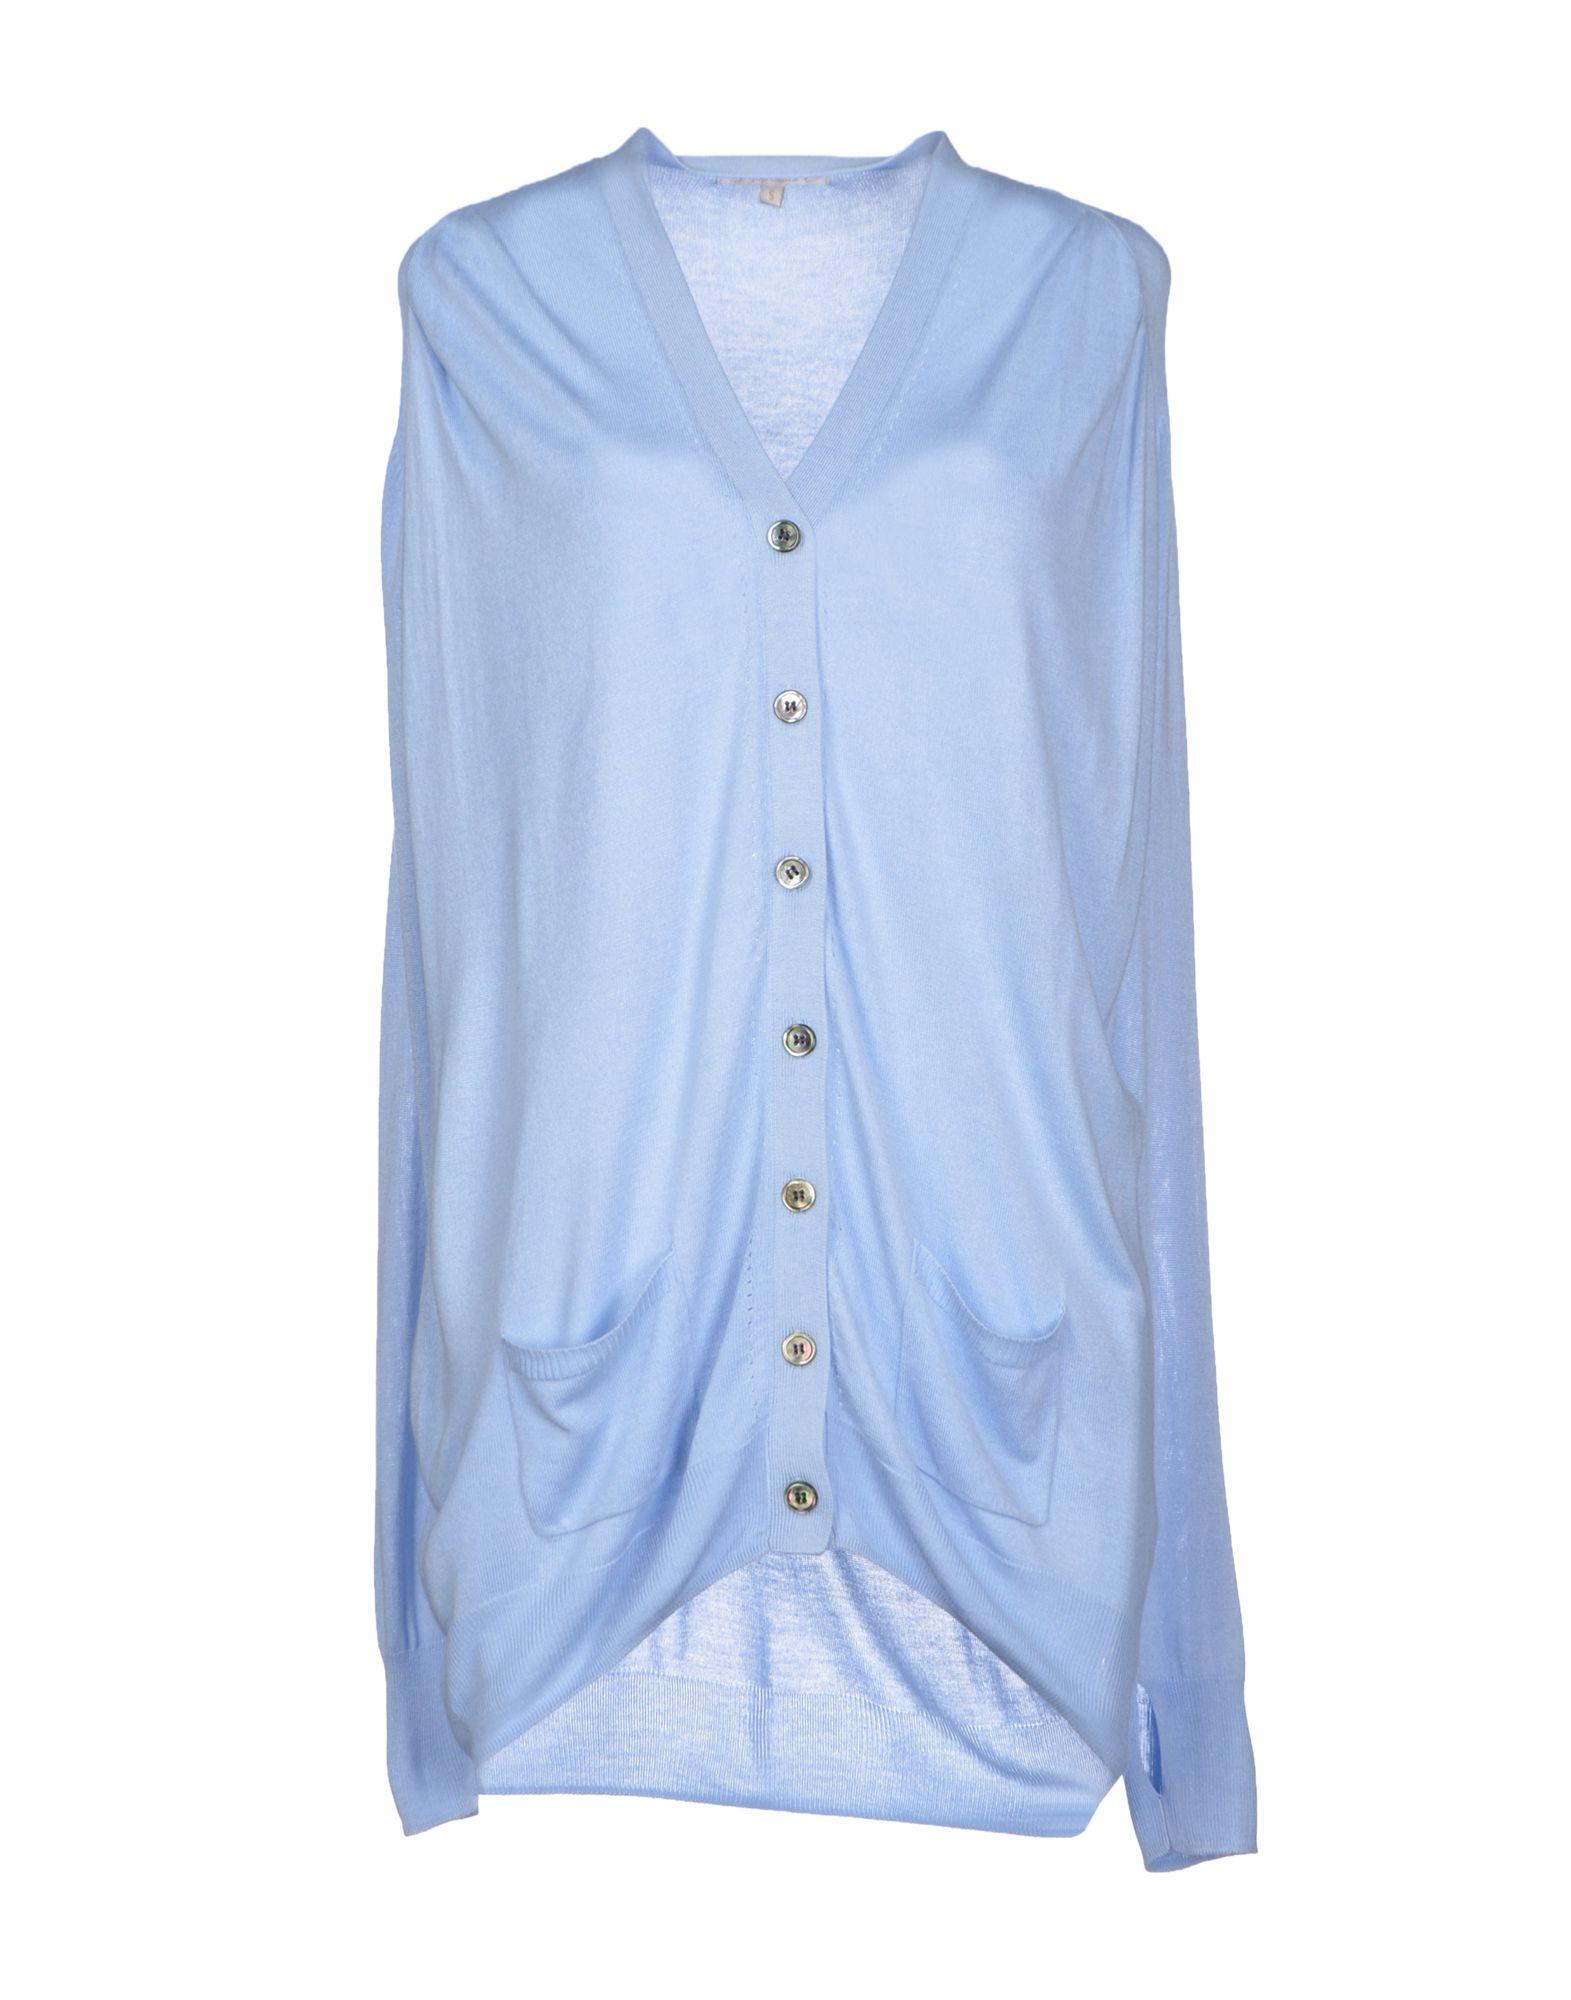 GOLD HAWK Damen Strickjacke Farbe Himmelblau Größe 4